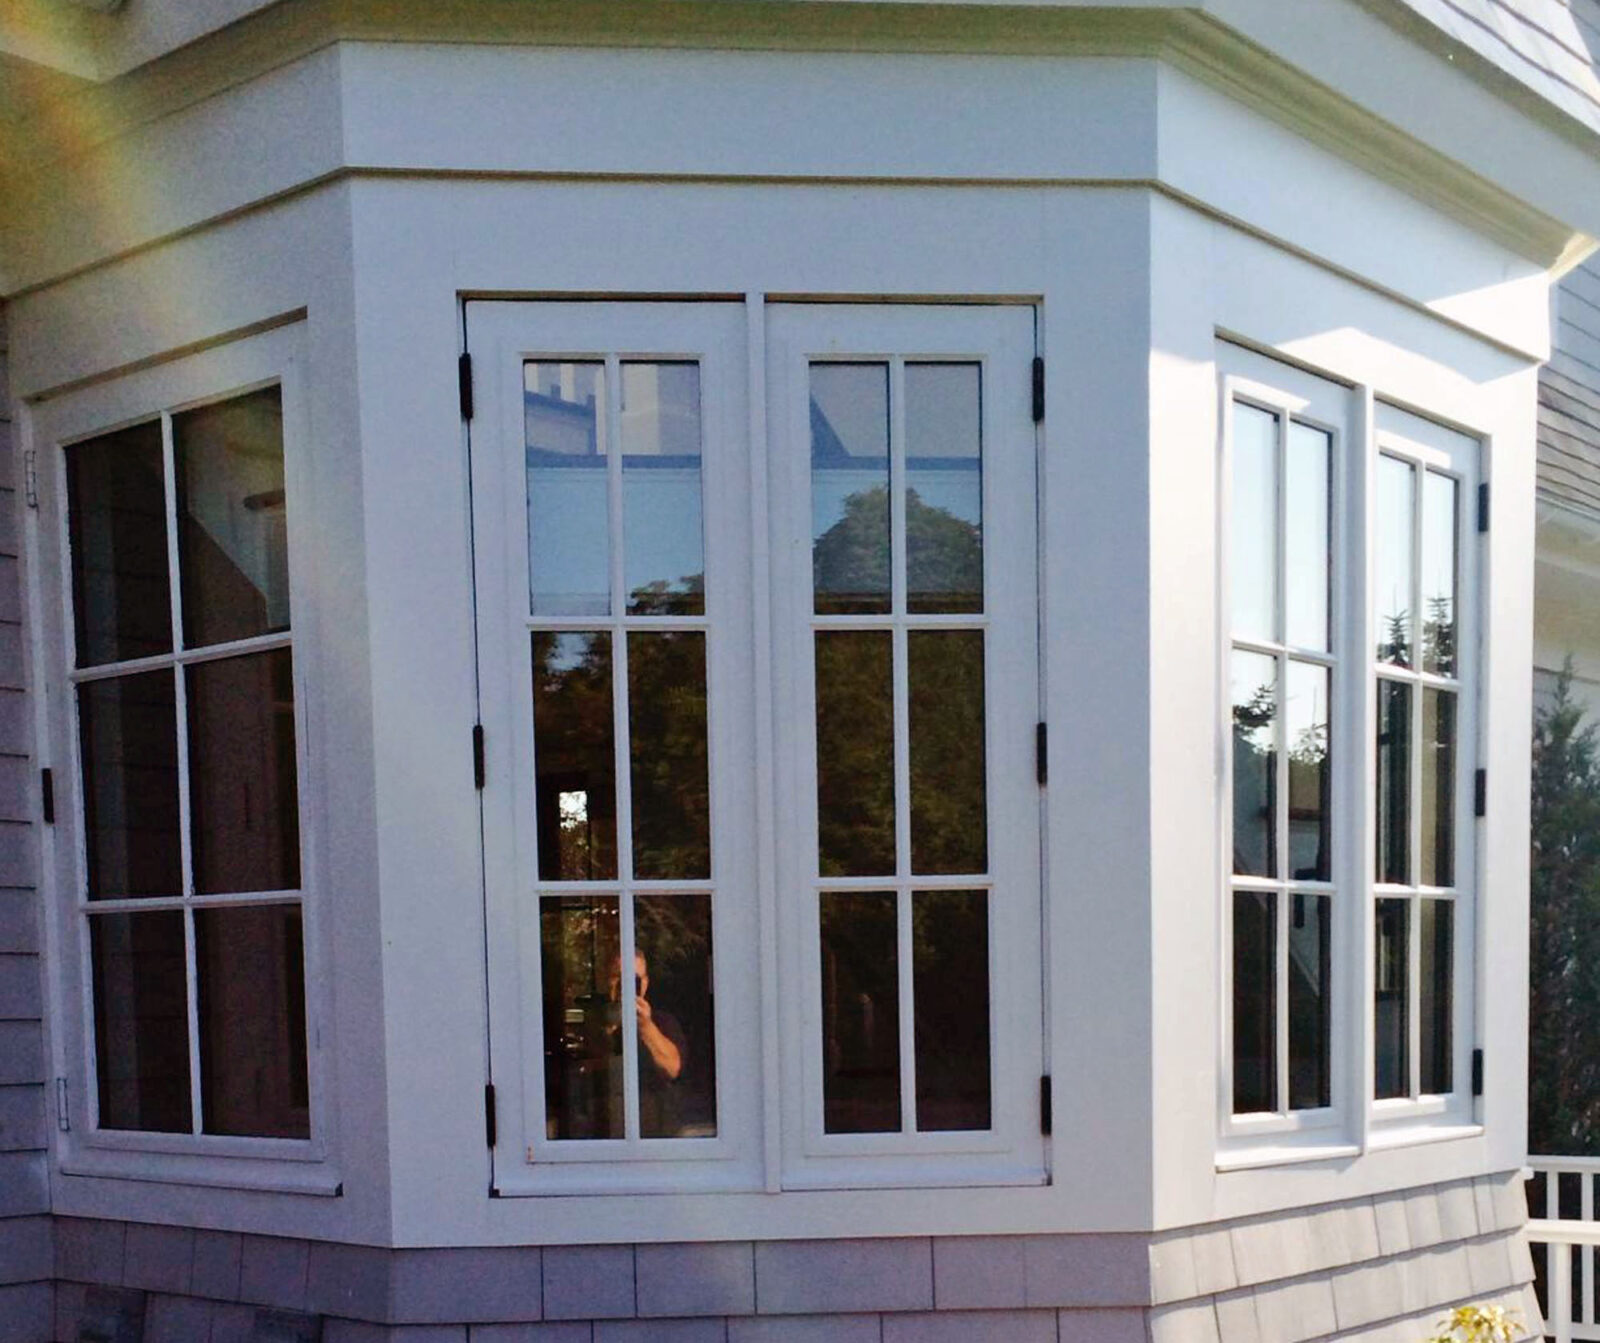 EAST HAMPTON WINDOWS